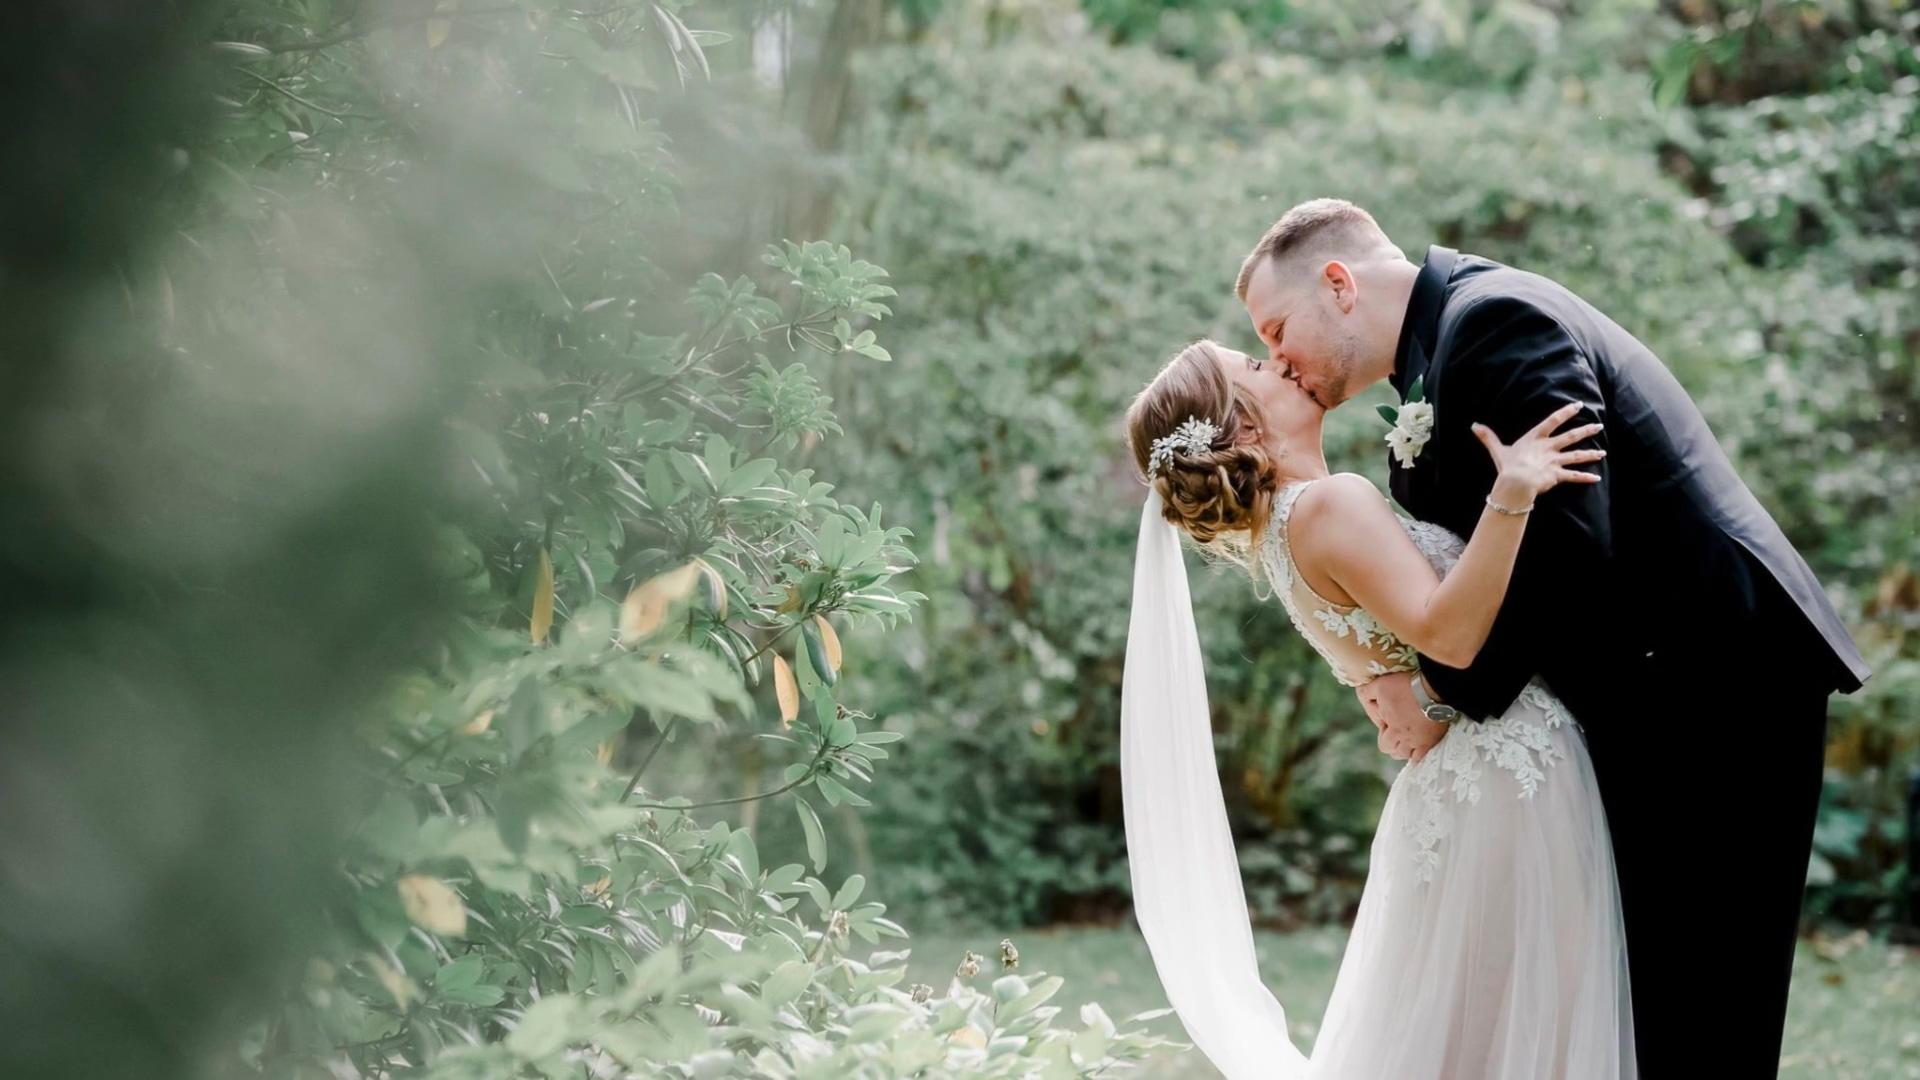 2020_Wedding_Photos_at_Islip_Grange_Park_1080p